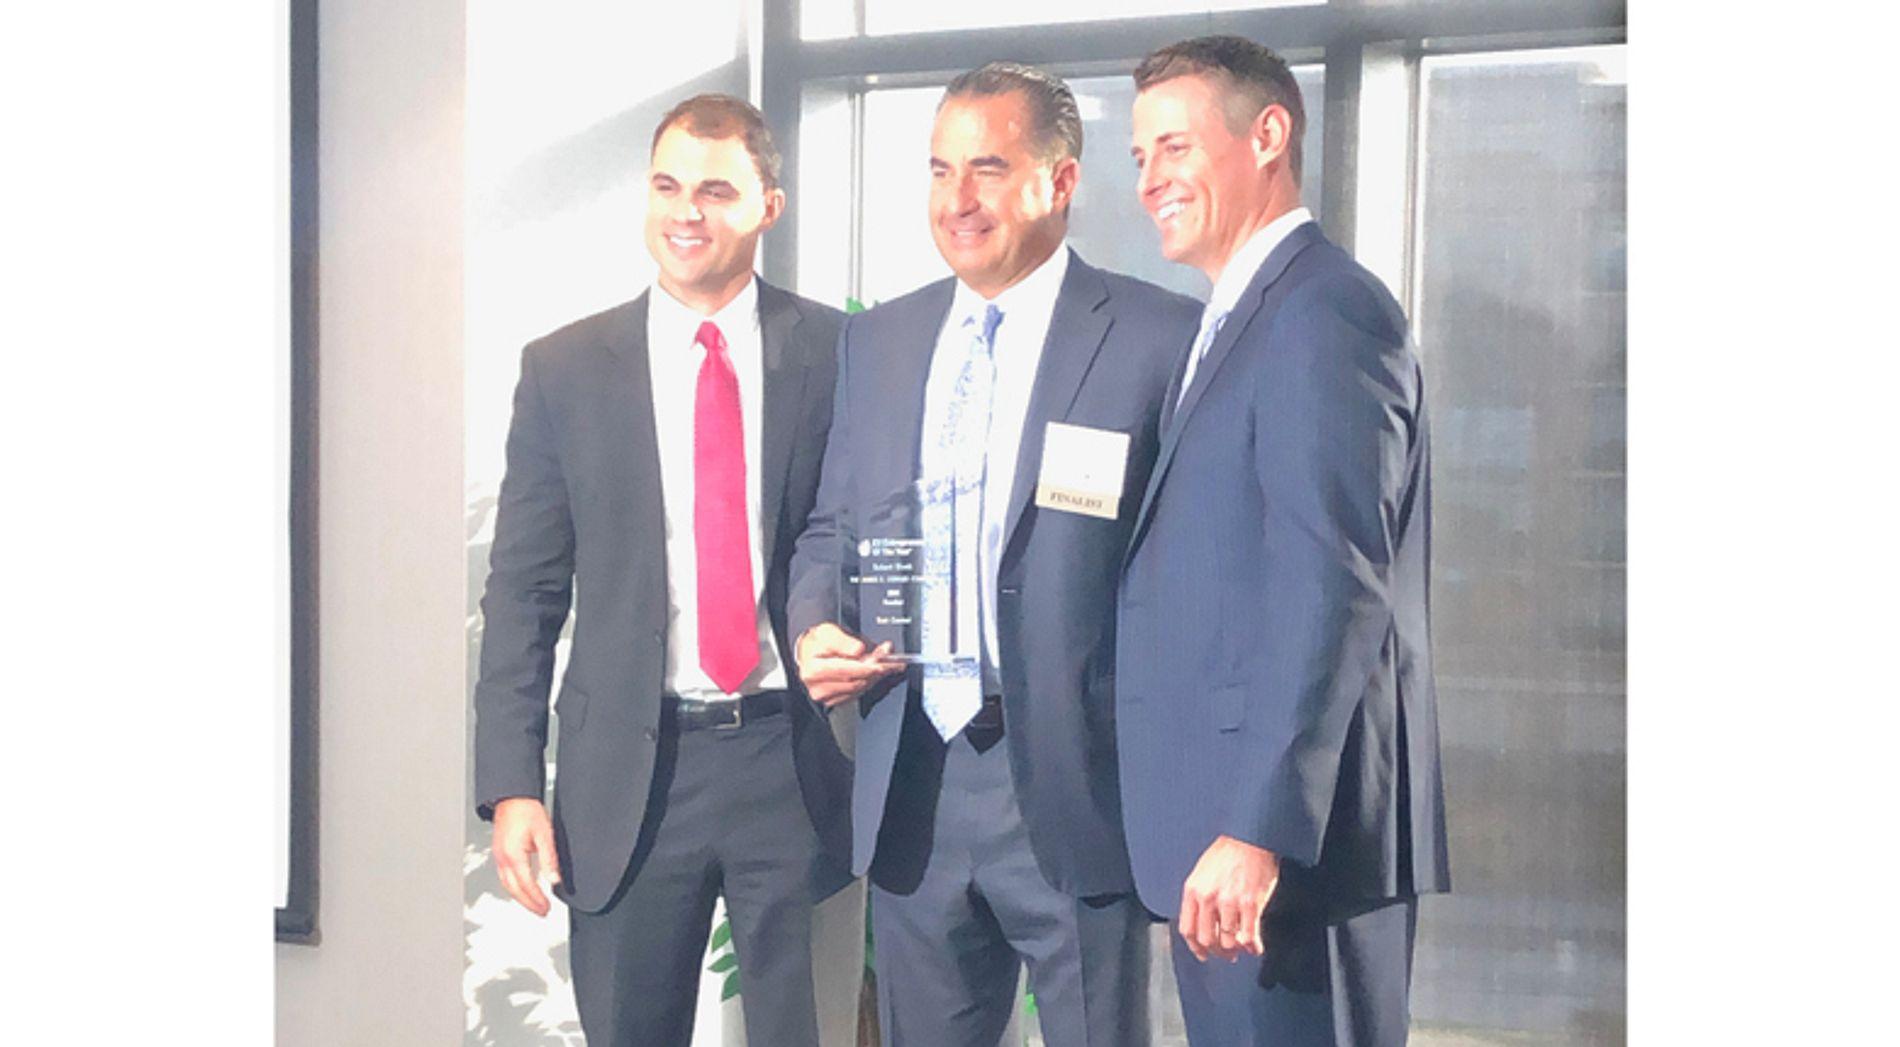 Bob Klonk of Oswald Companies receiving an award